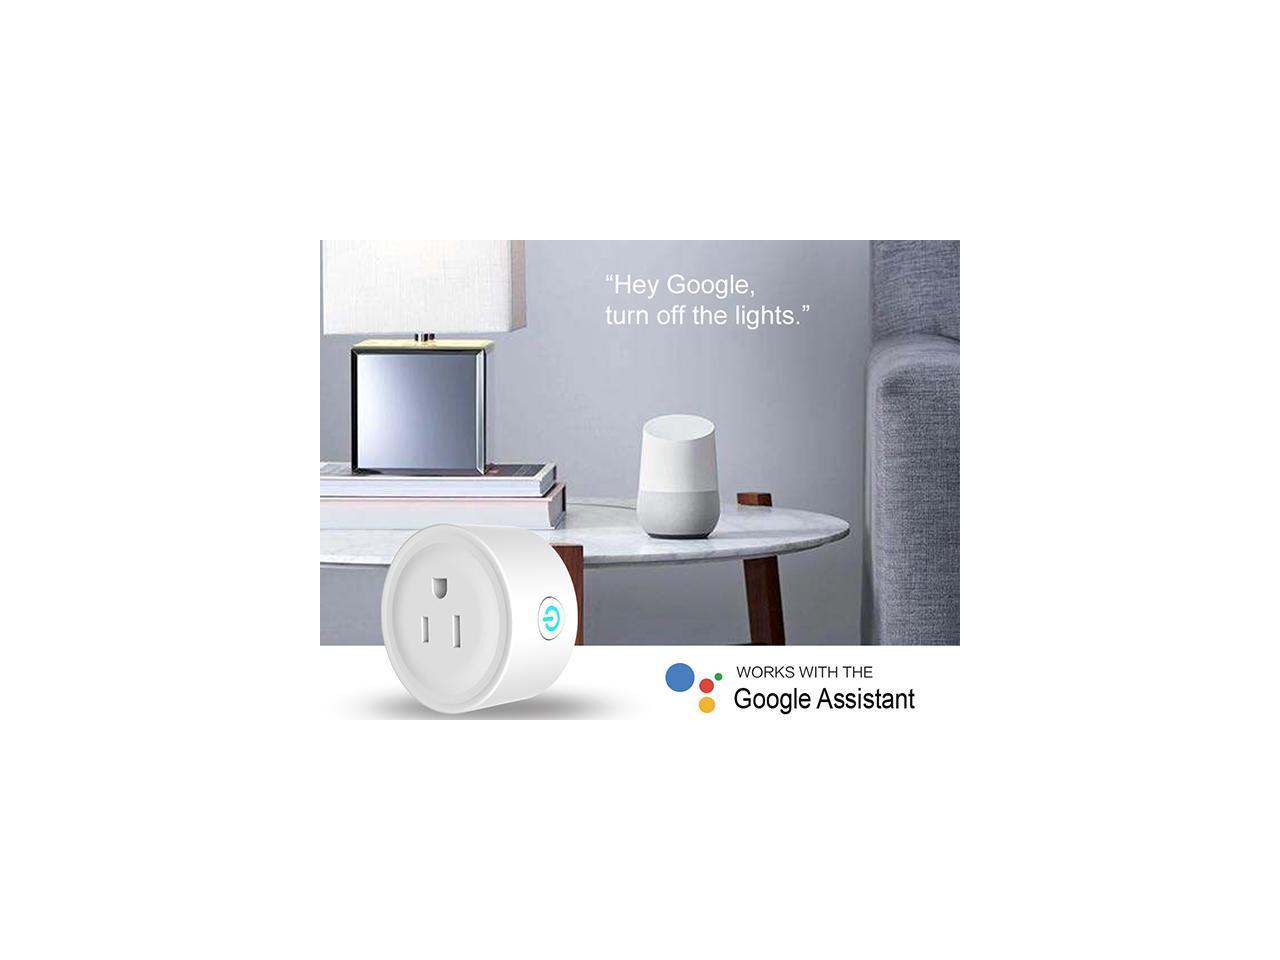 Avatarcontrols Wifi Smart Plug Wireless Wifi Outlet